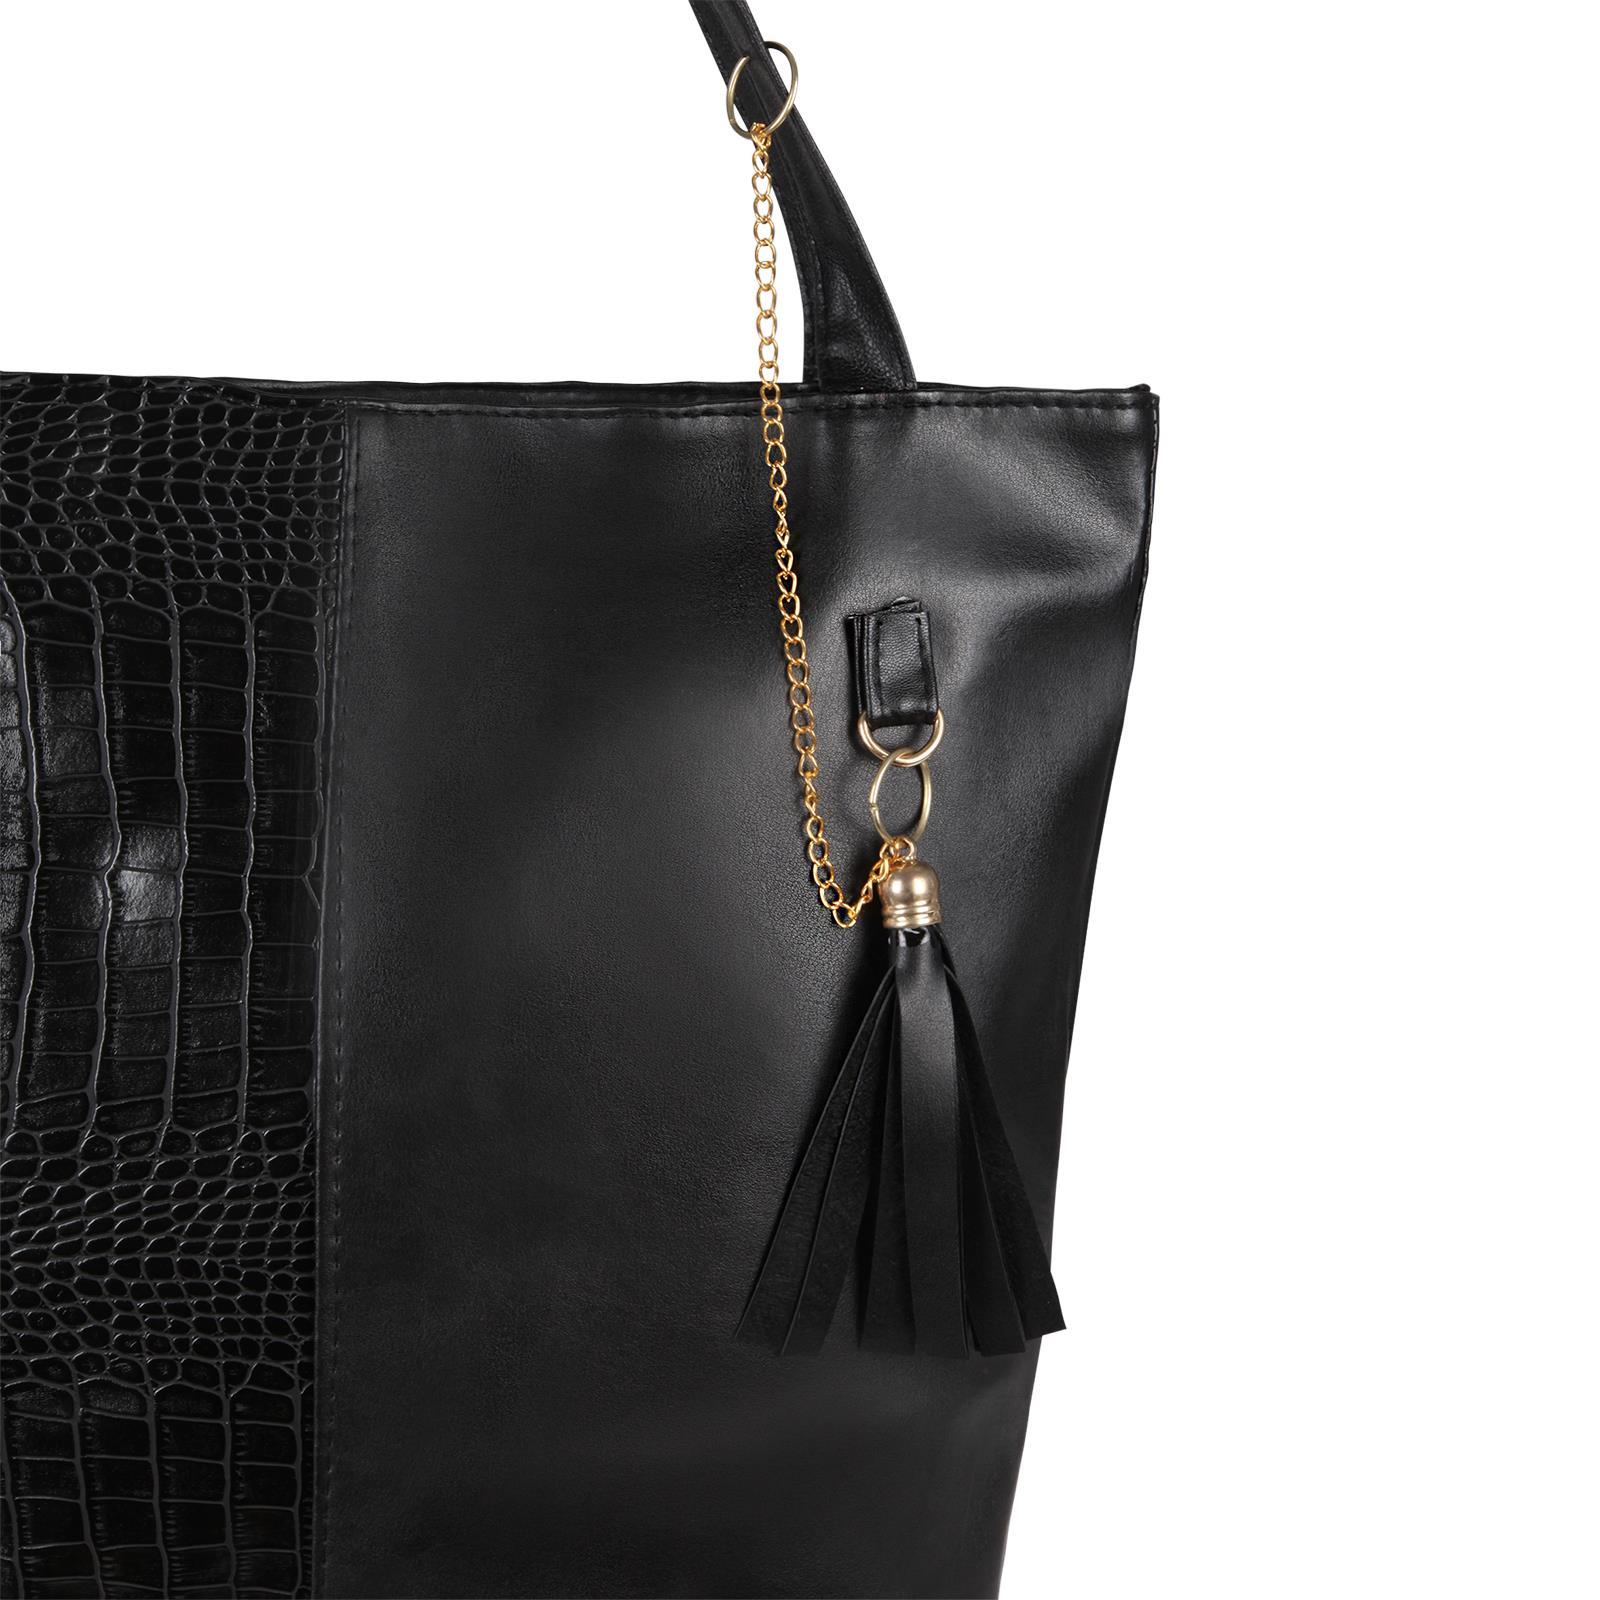 Animal-Print-Handbag-PU-Leather-Shoulder-Bag-Work-Office-Tote-Shopper-Fashion thumbnail 3